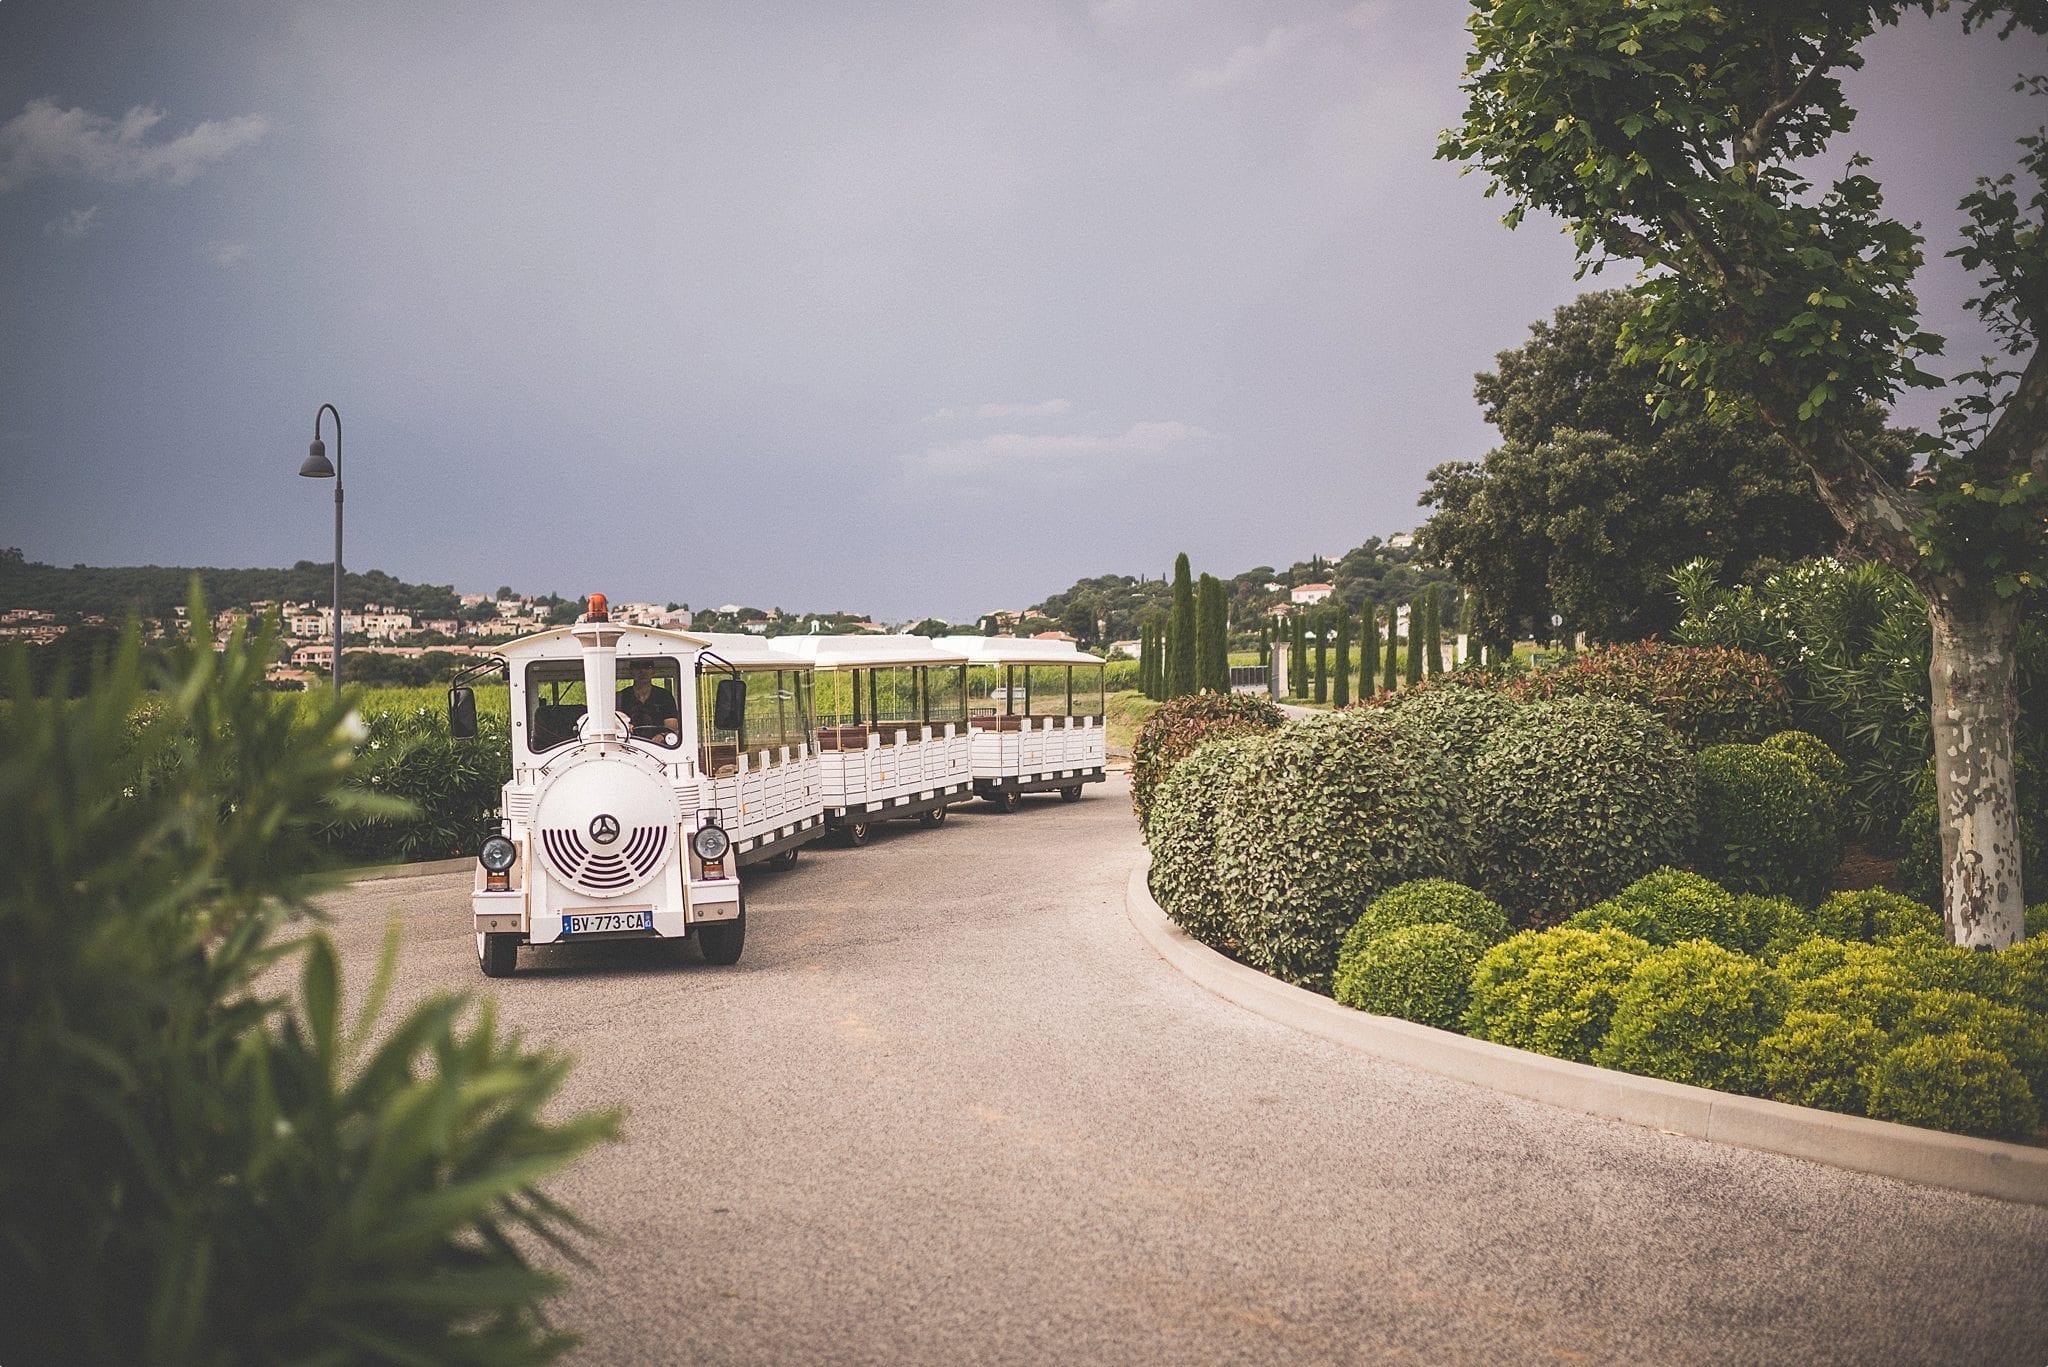 Domaine de la Croix Hotel L'Orangerie South of France vineyard and beach Wedding - Maria Assia Photography-297